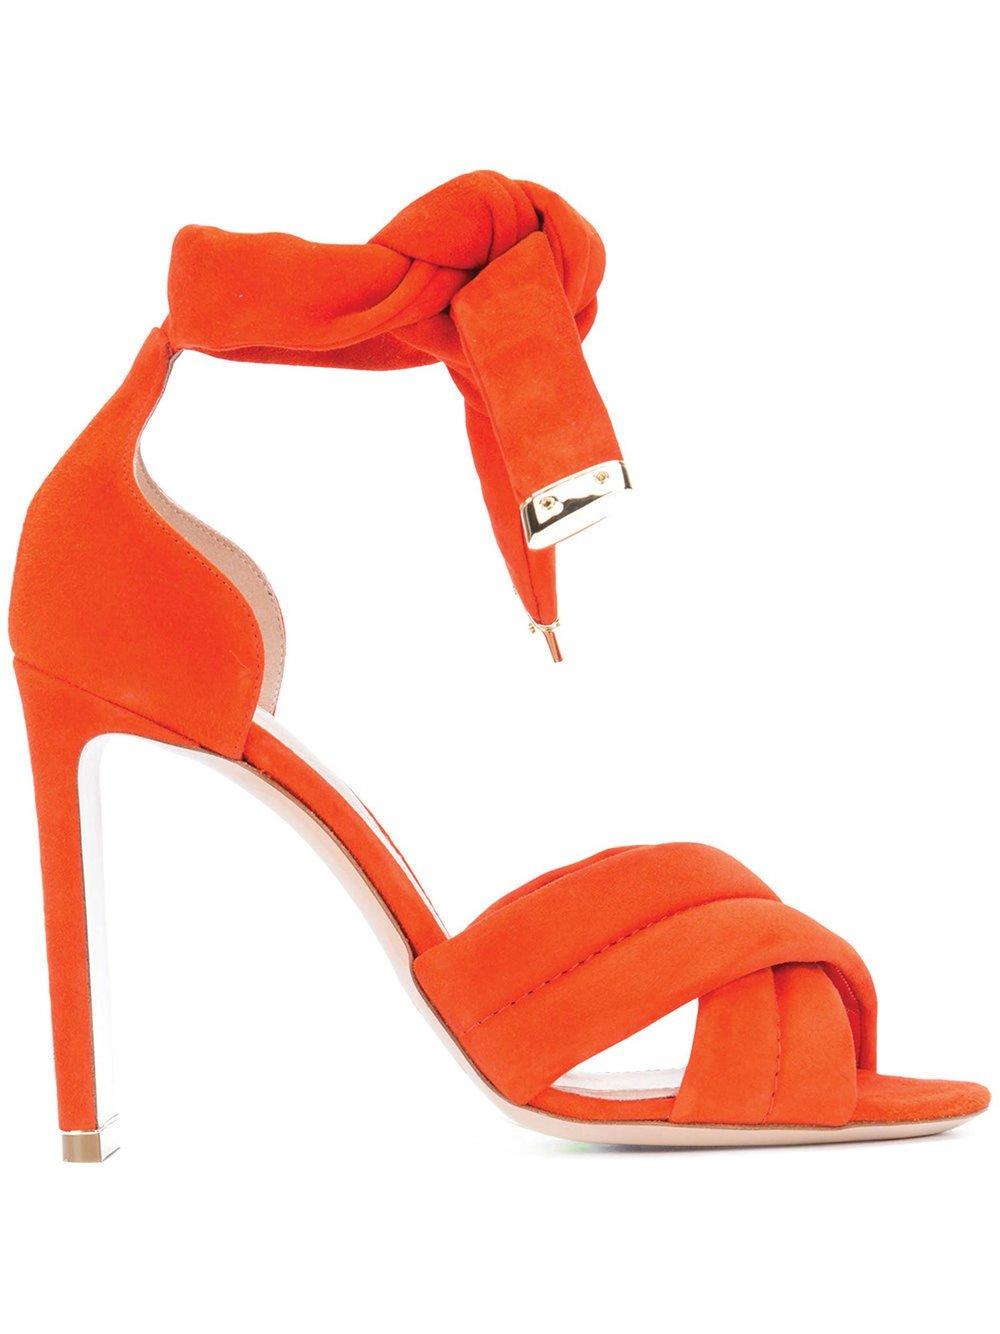 105mm Ziggy Sandals by Nicholas Kirkwood $1,250 尼可拉斯.科克伍德瑞格涼鞋